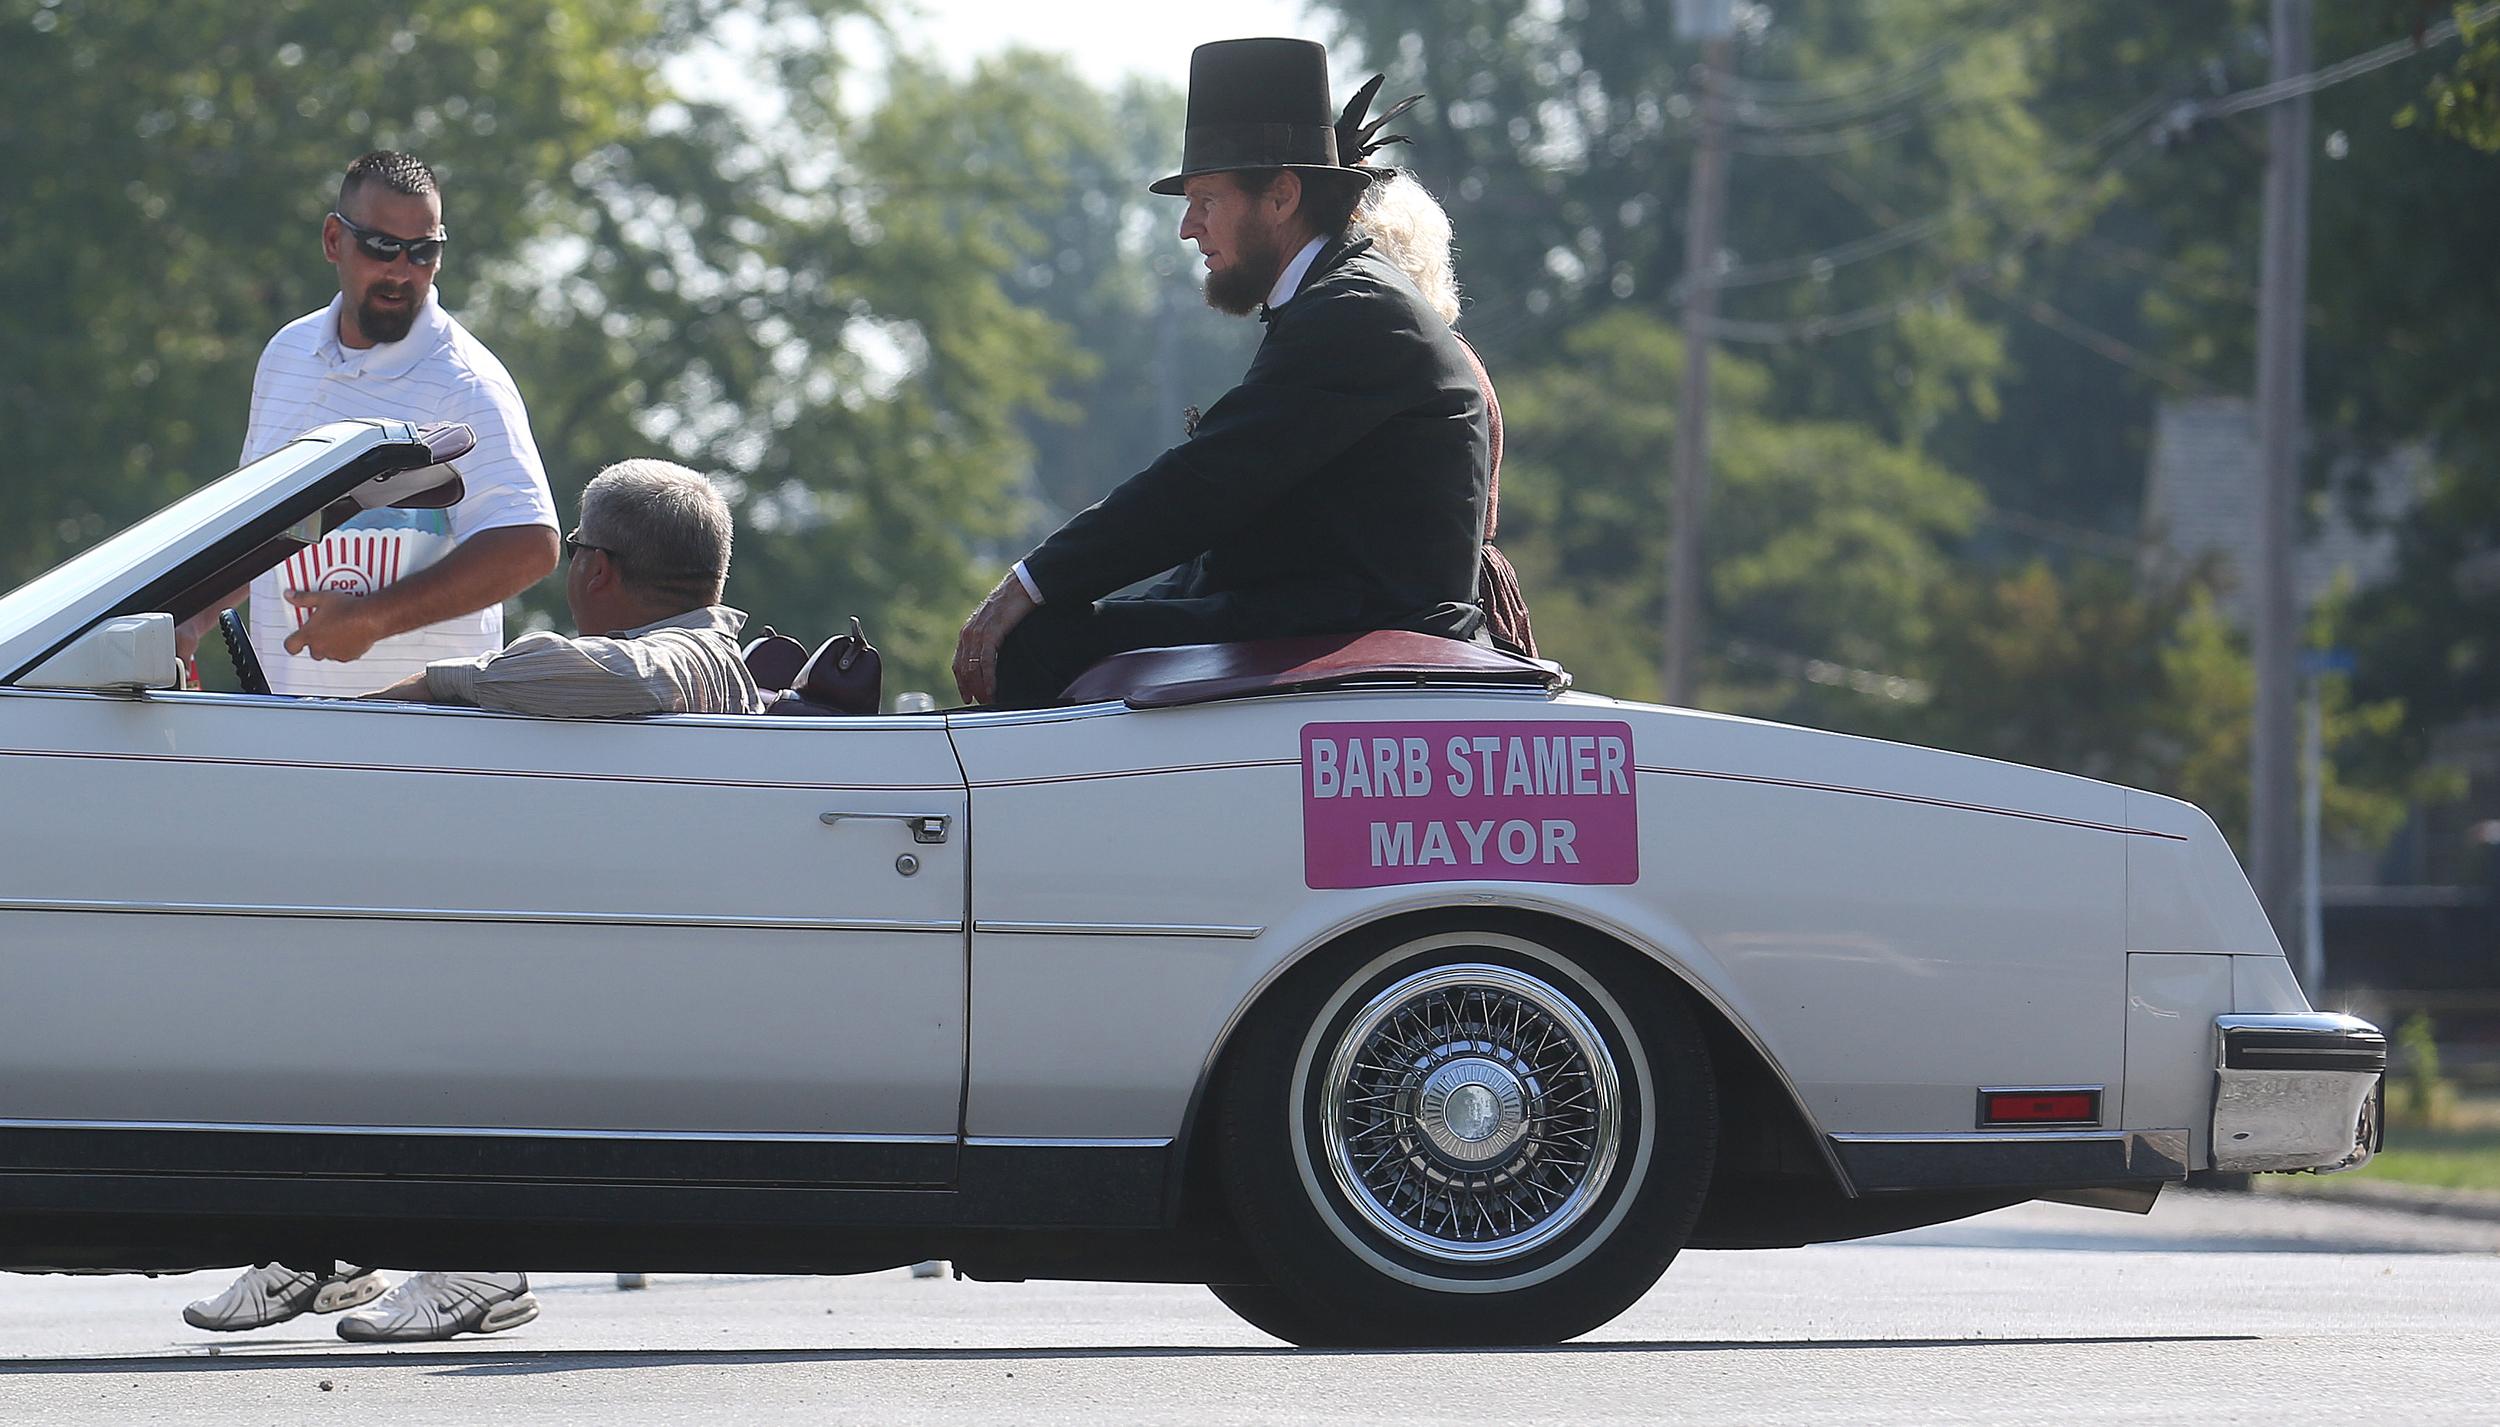 Auburn Labor Day Picnic Saay, Sept. 5, 2015 — The Visual Journal